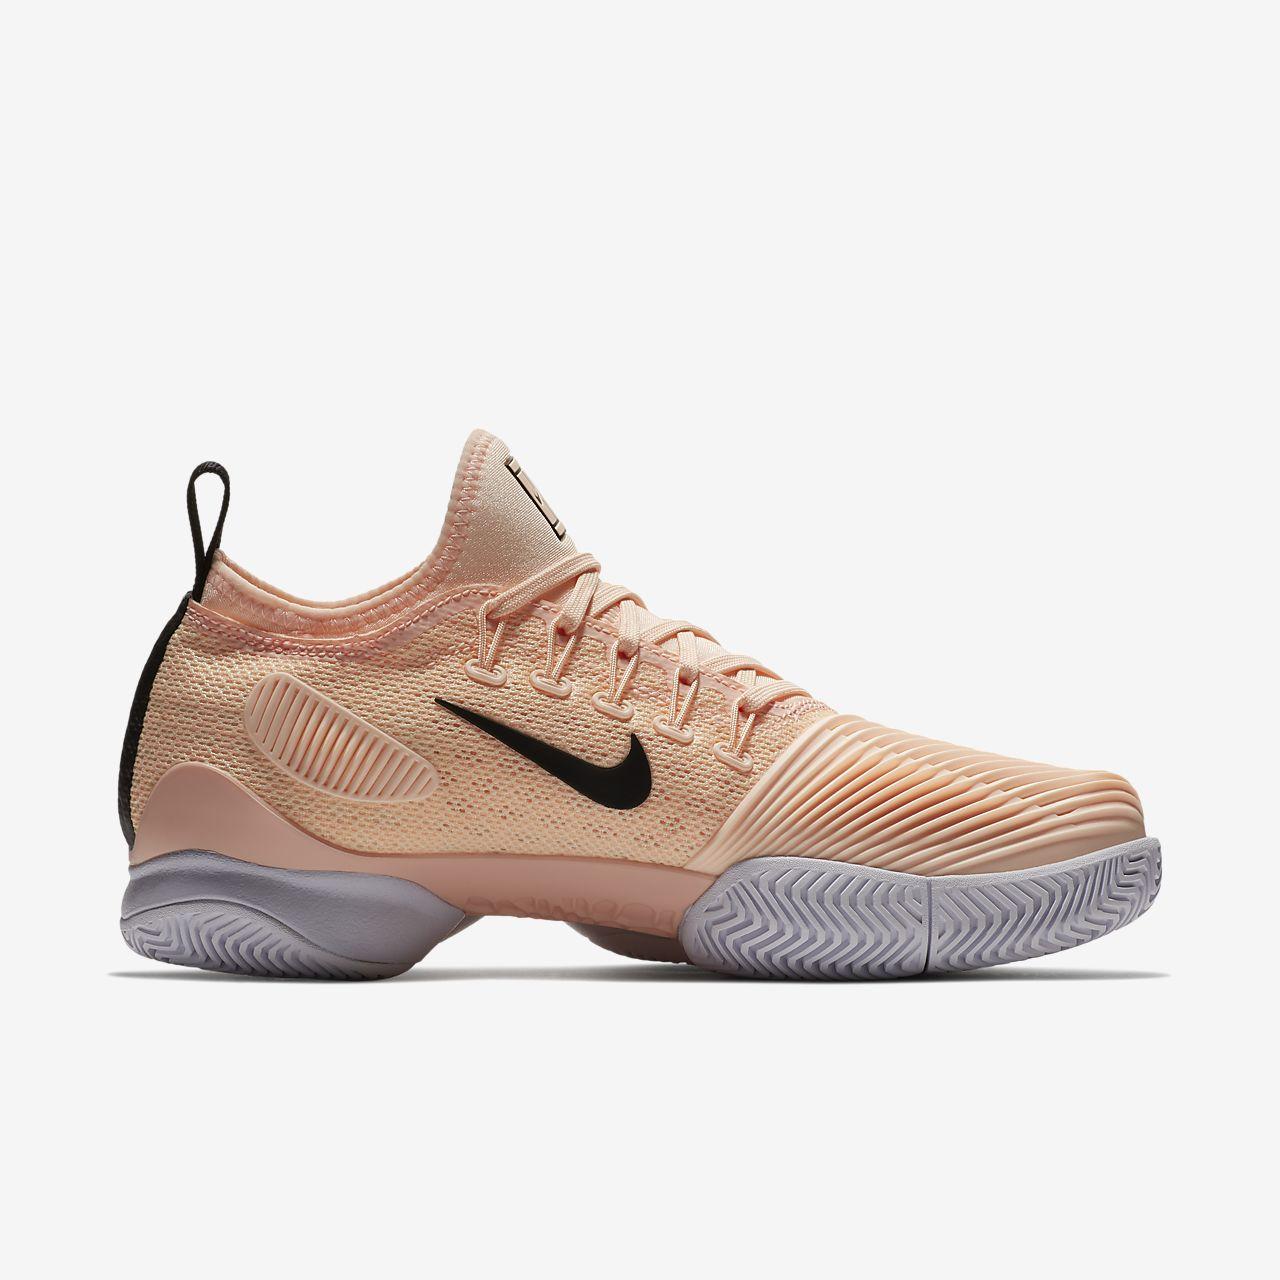 ... NikeCourt Air Zoom Ultra Rct Women's Tennis Shoe